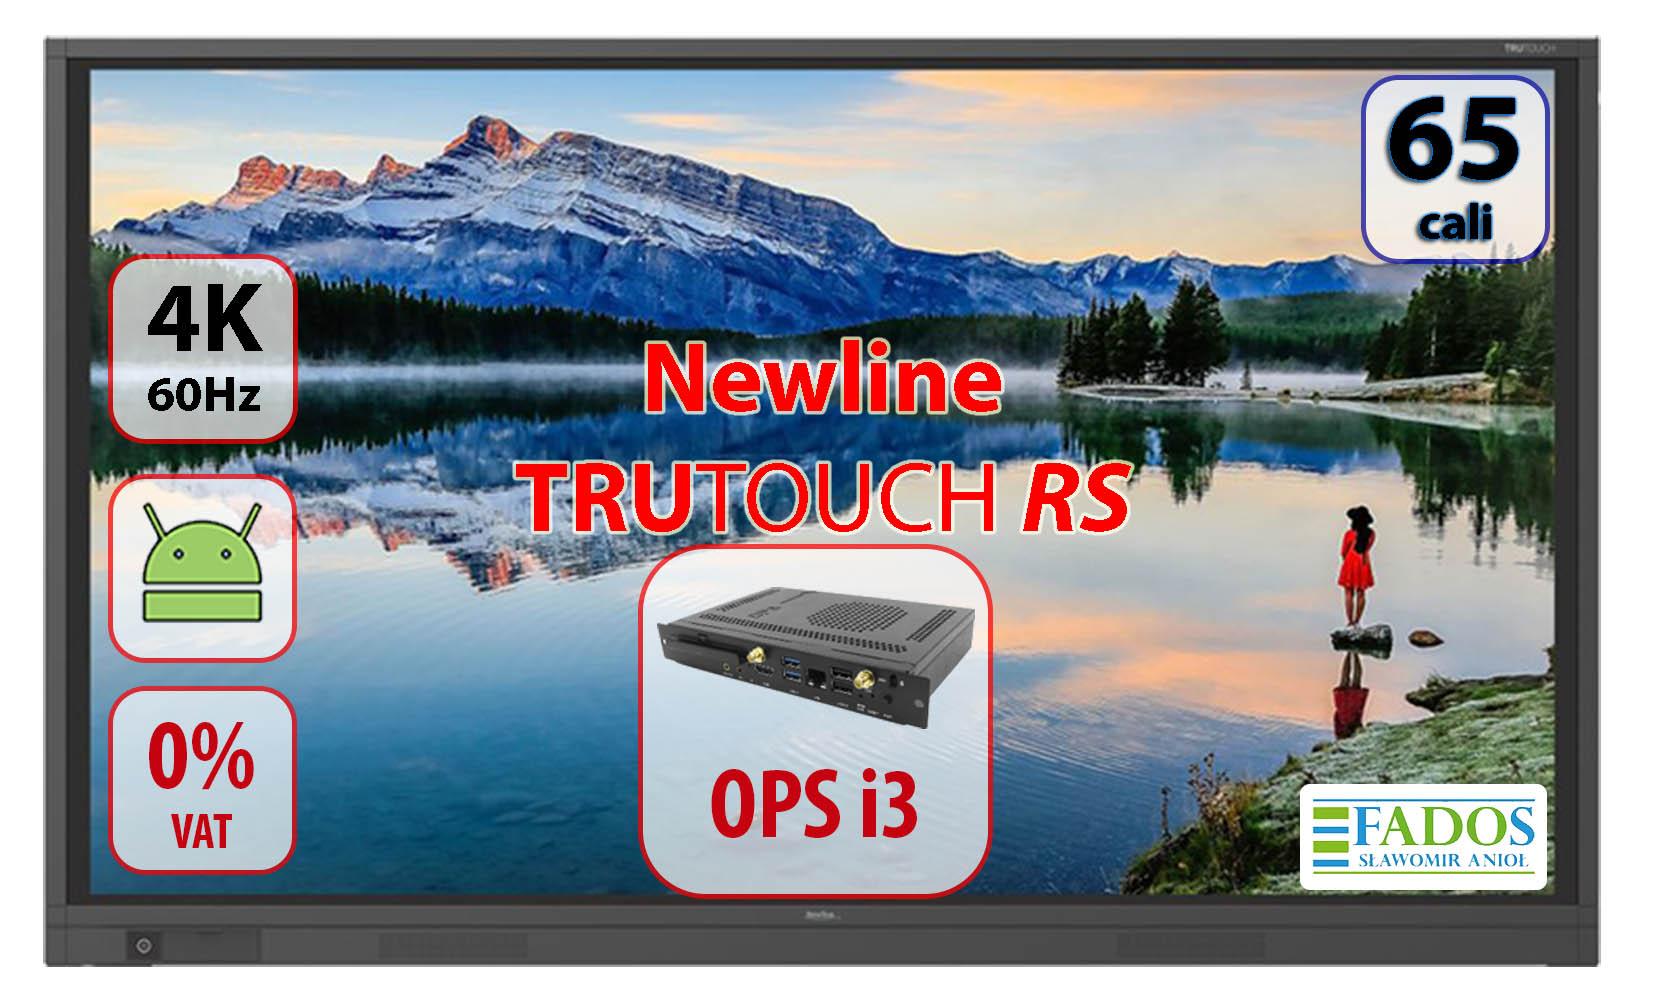 Newline TruToucj TT-6518RS z OPS i3 0 VAT